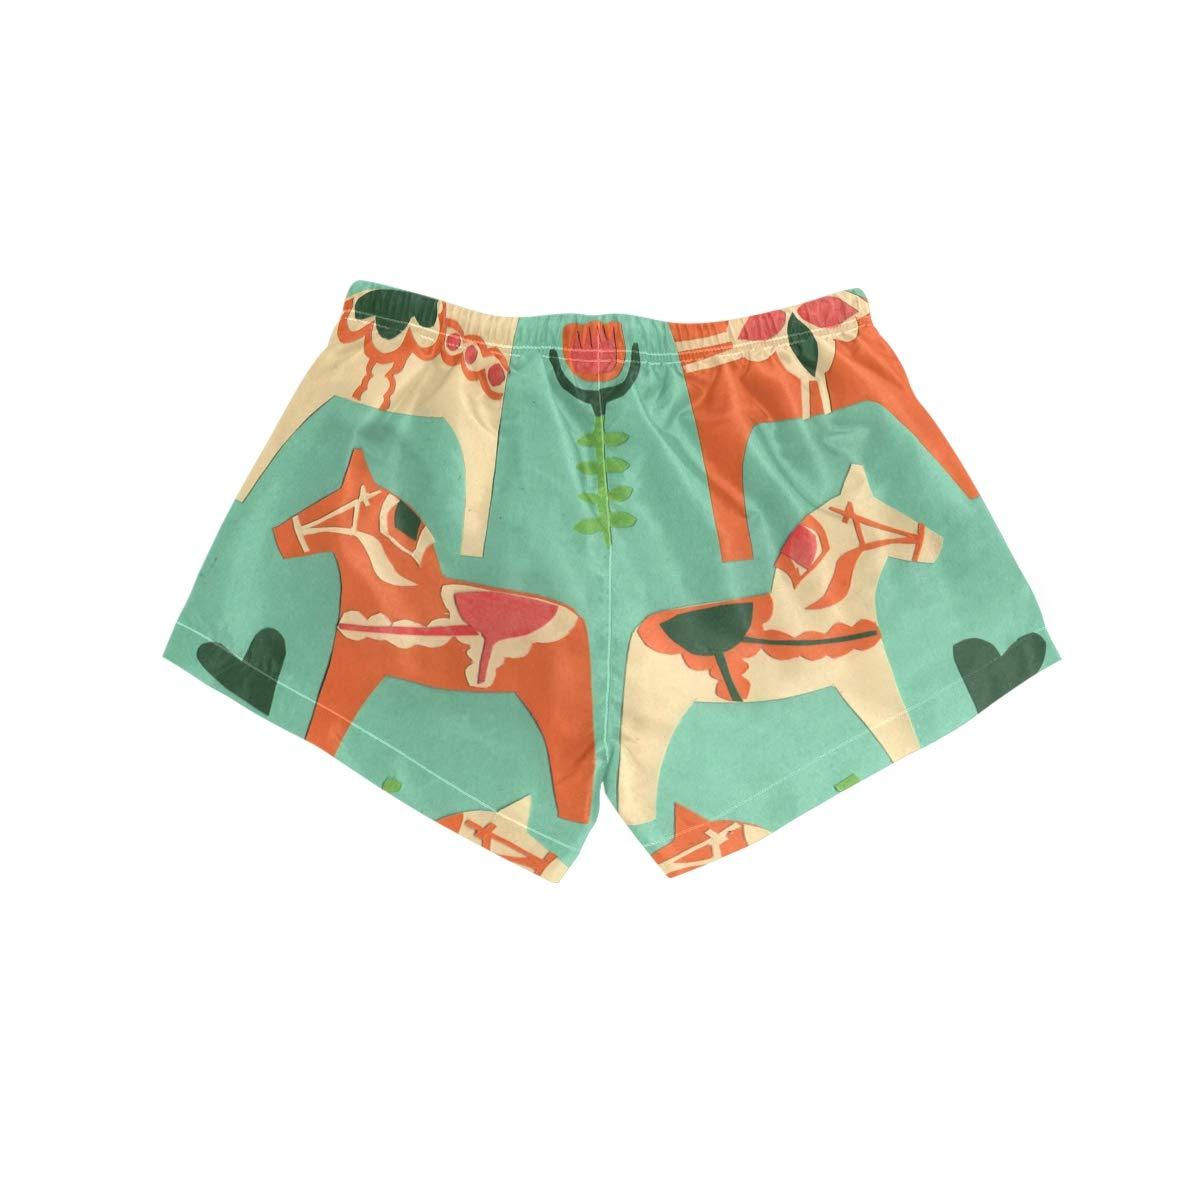 NWTSPY Horse Papercut Womens Sport Beach Swim Shorts Board Shorts Swimsuit with Mesh Lining